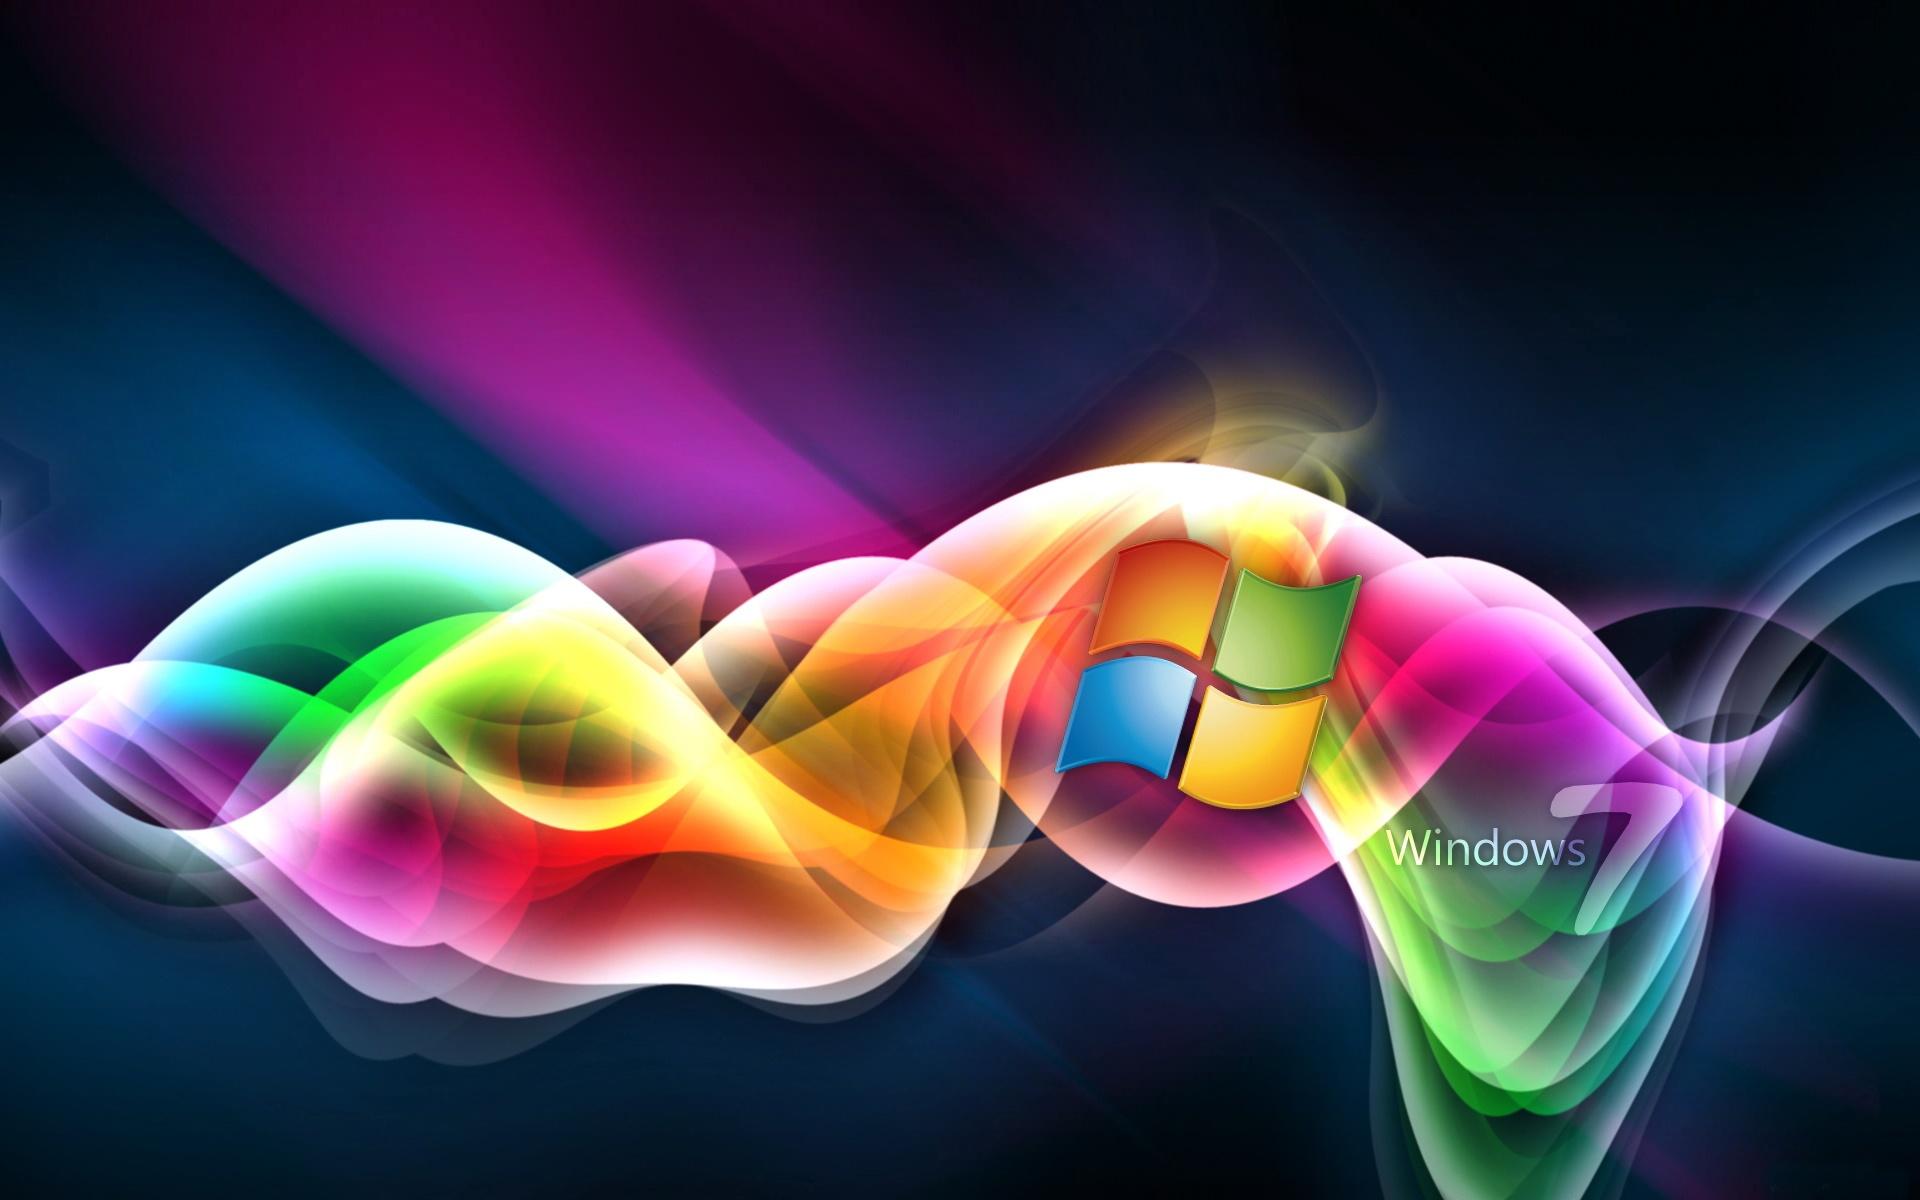 45 Spectacular Windows 7 Desktop Backgrounds 1920x1200